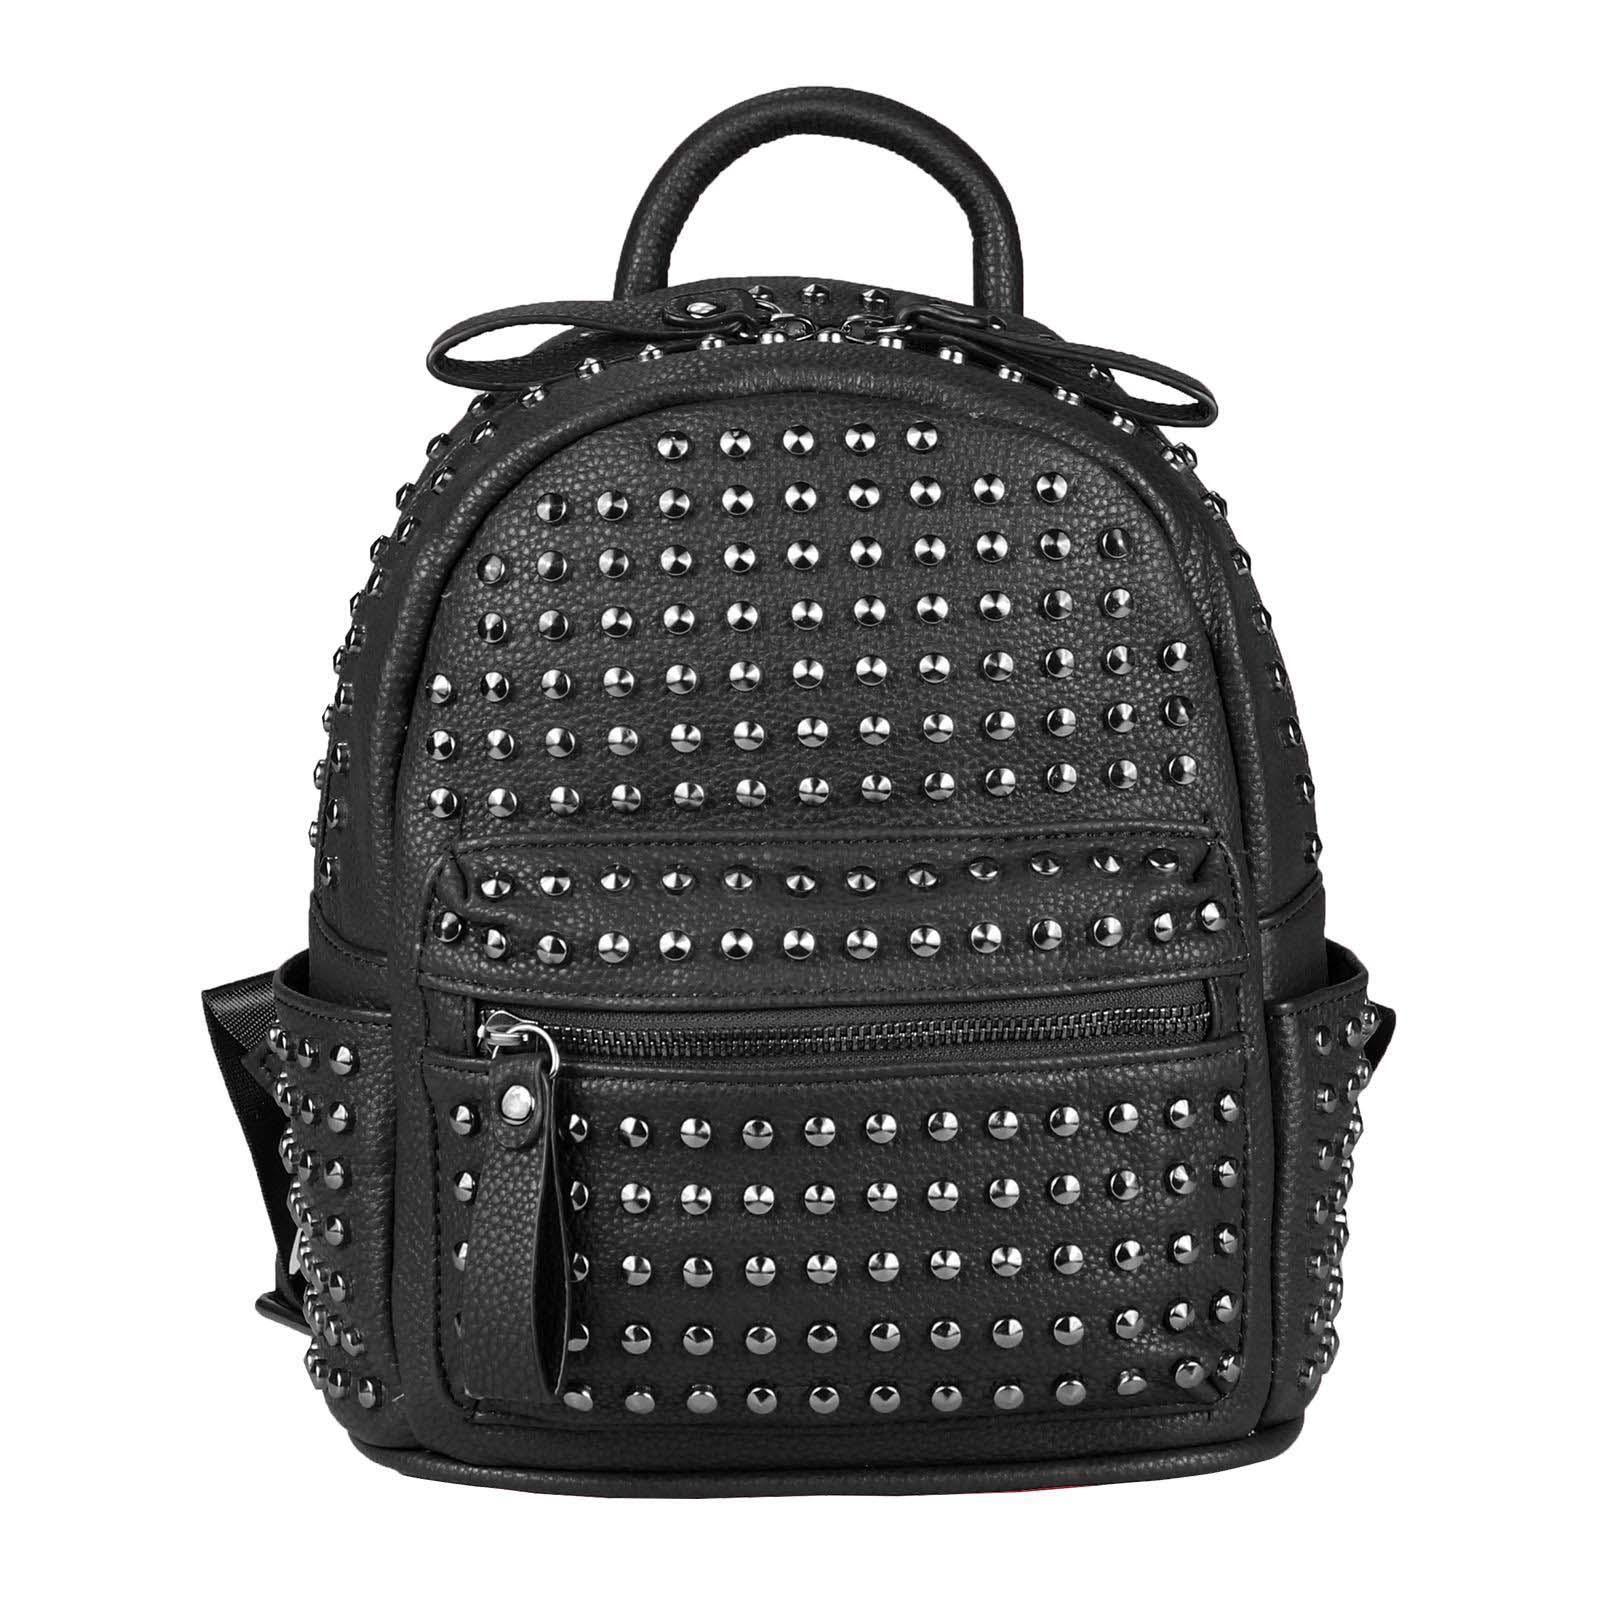 1c8506c44e634 DAMEN NIETEN RUCKSACK TASCHE Cityrucksack Stadtrucksack Metallic Backpack  Schultertasche Handtasche Umhängetasche Shopper Daypack Schwarz